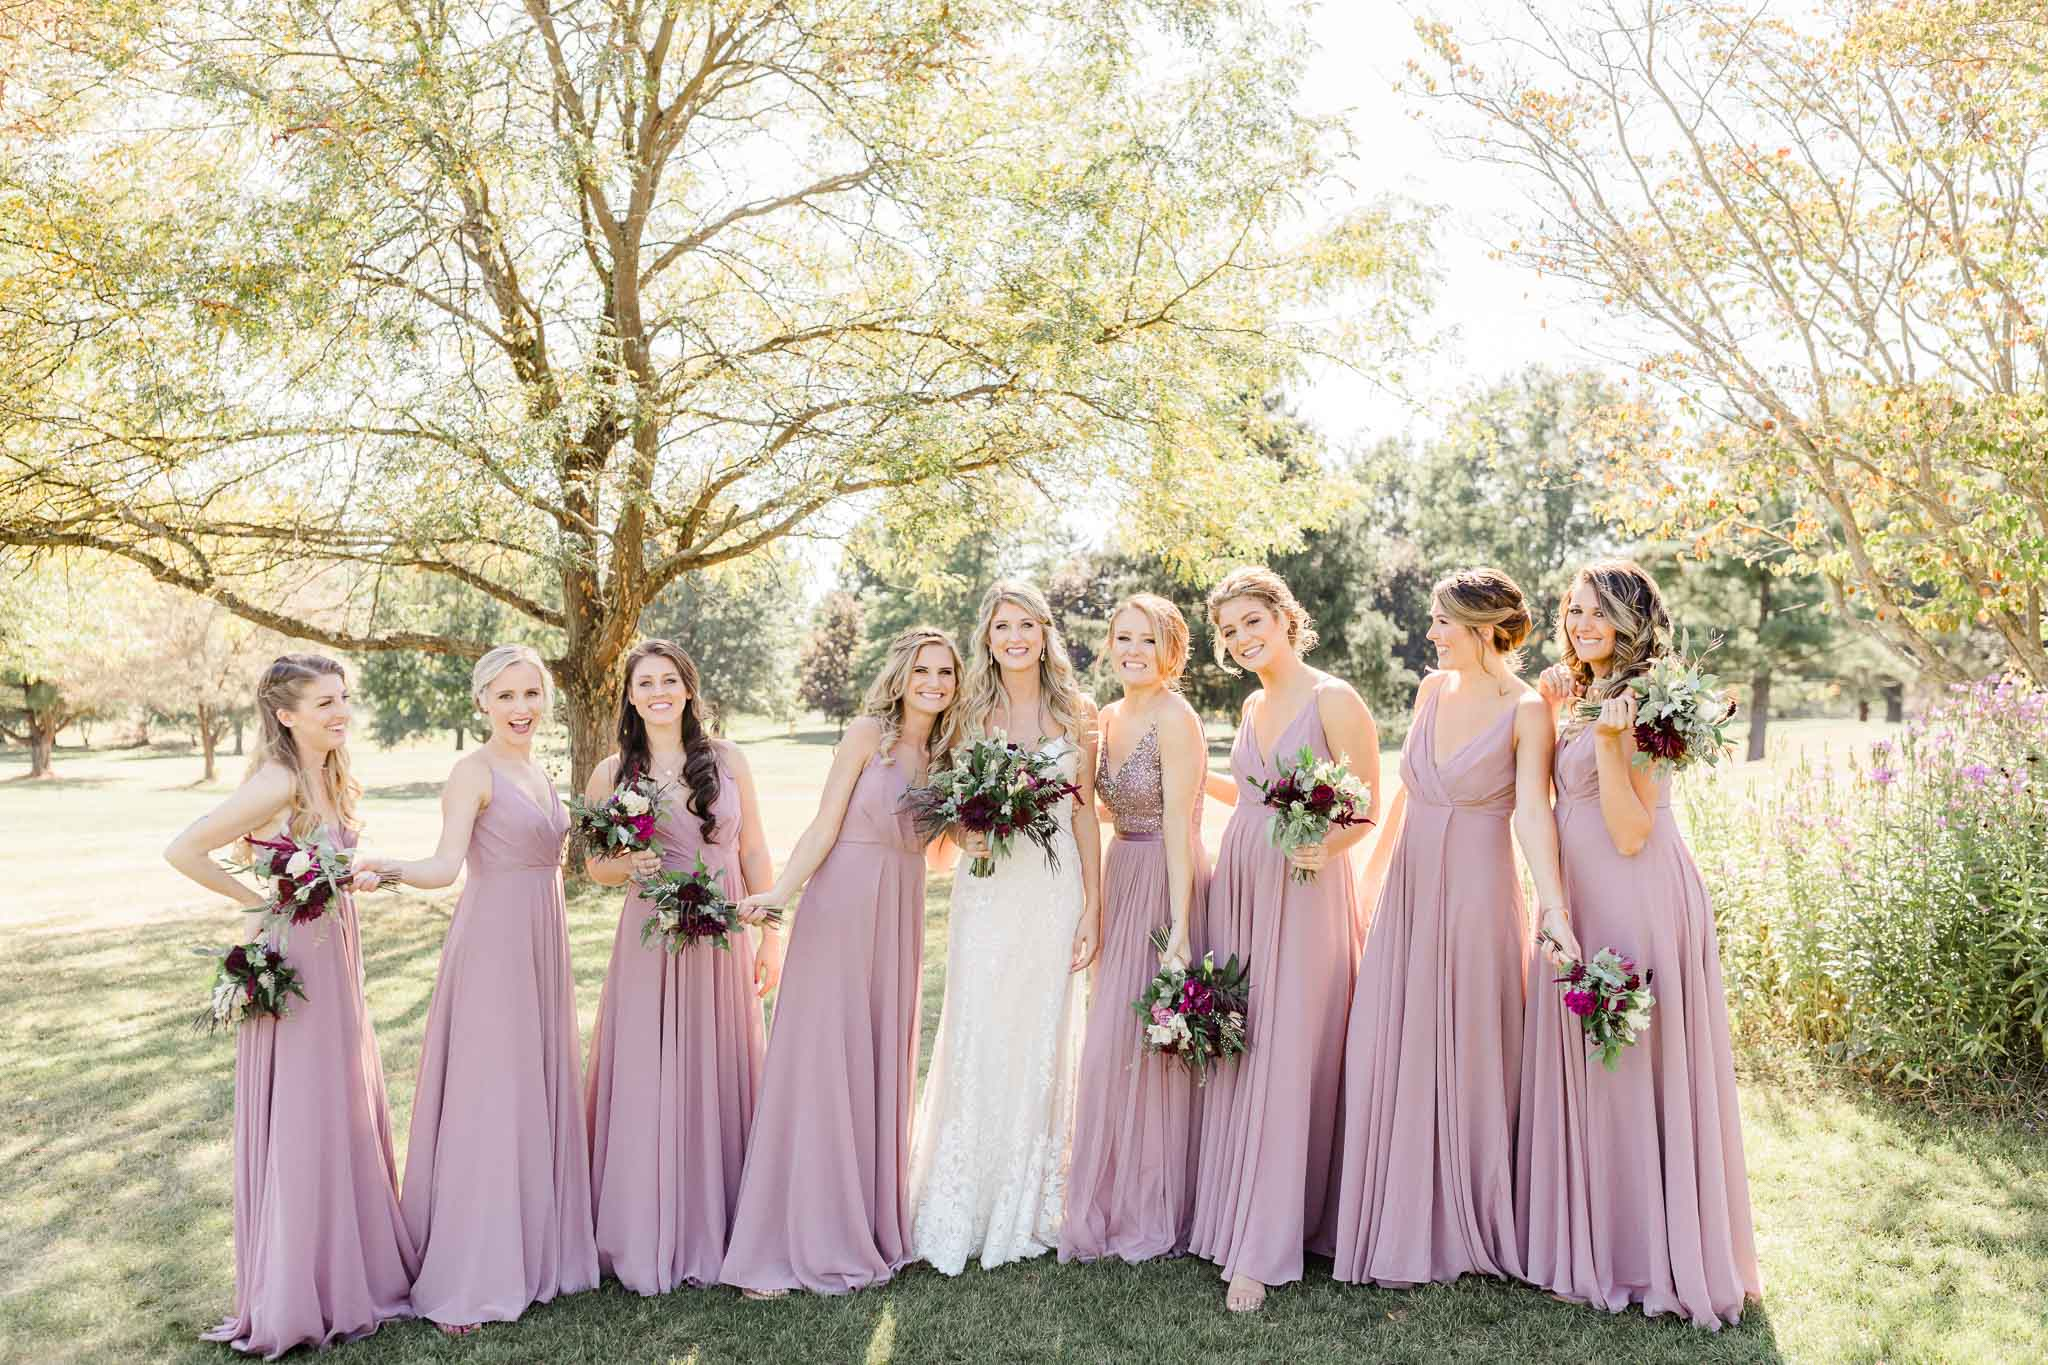 Frosty-Valley-September-Wedding-7549.jpg